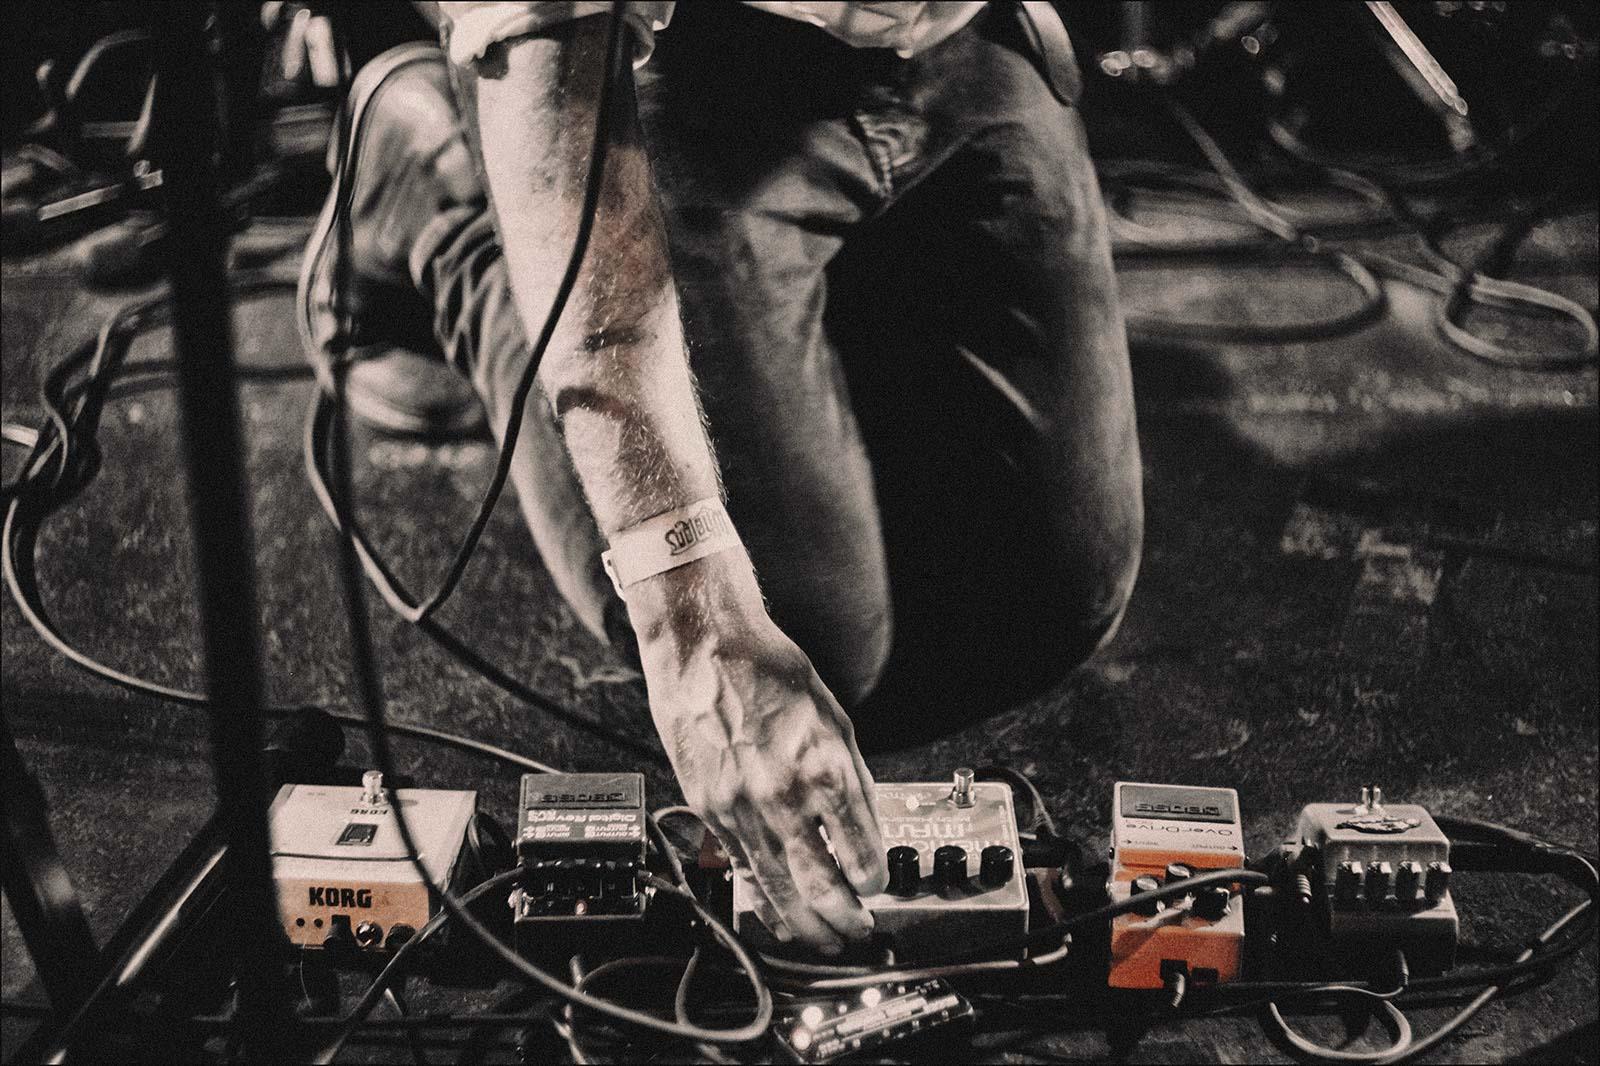 come_on_live_long_album_launch_whelans_dublin008.jpg